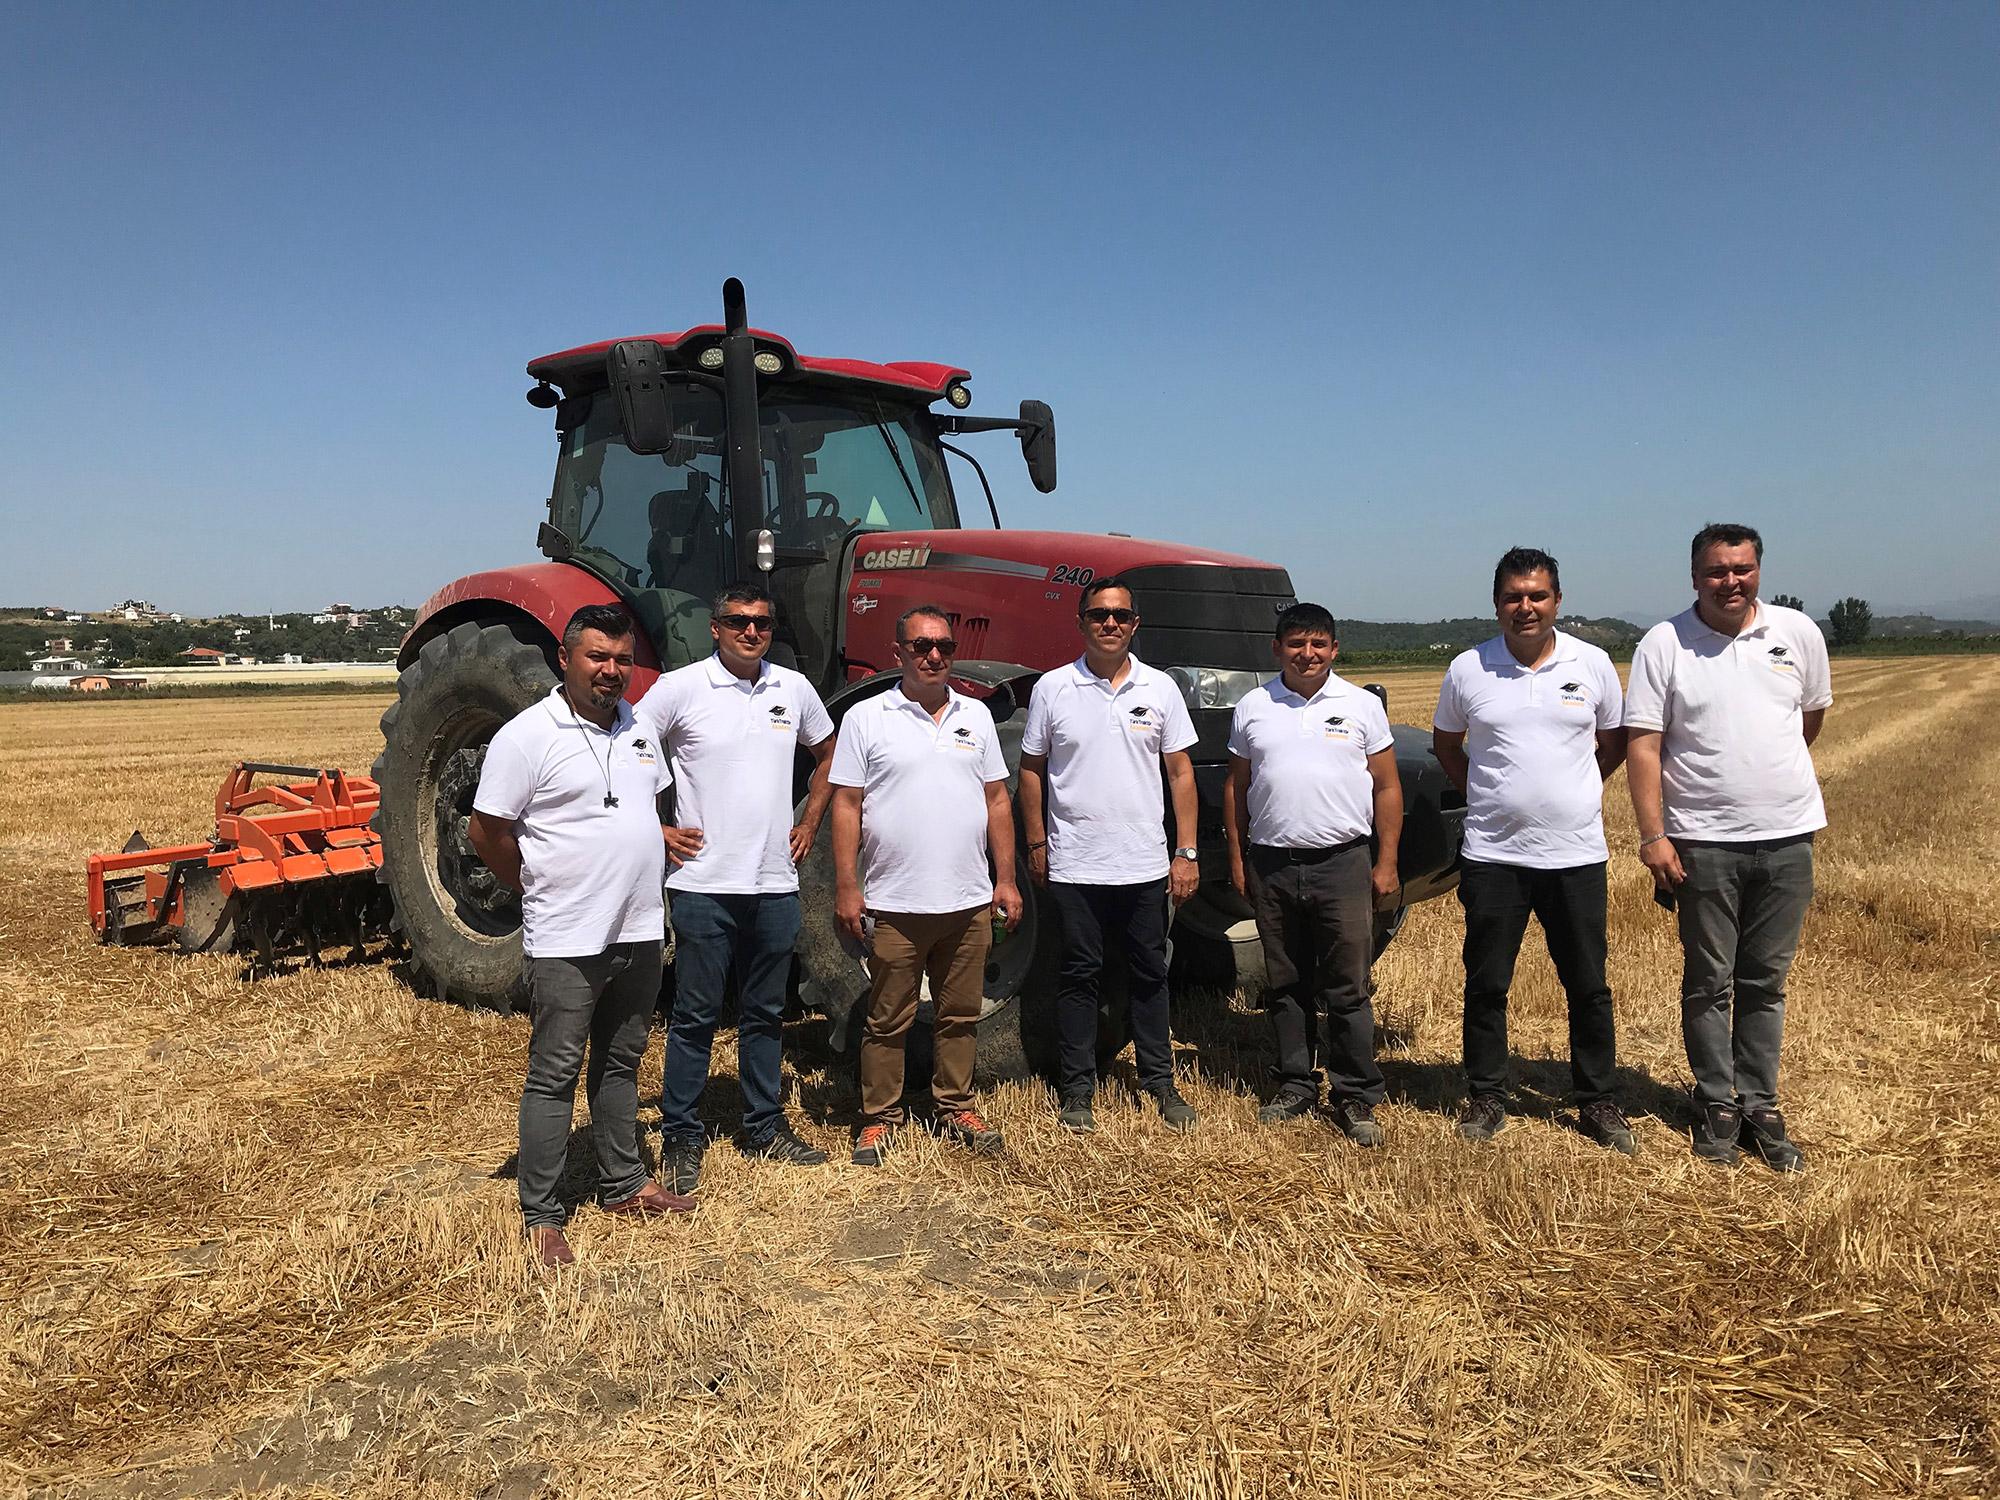 turk-traktor-akademi.jpg